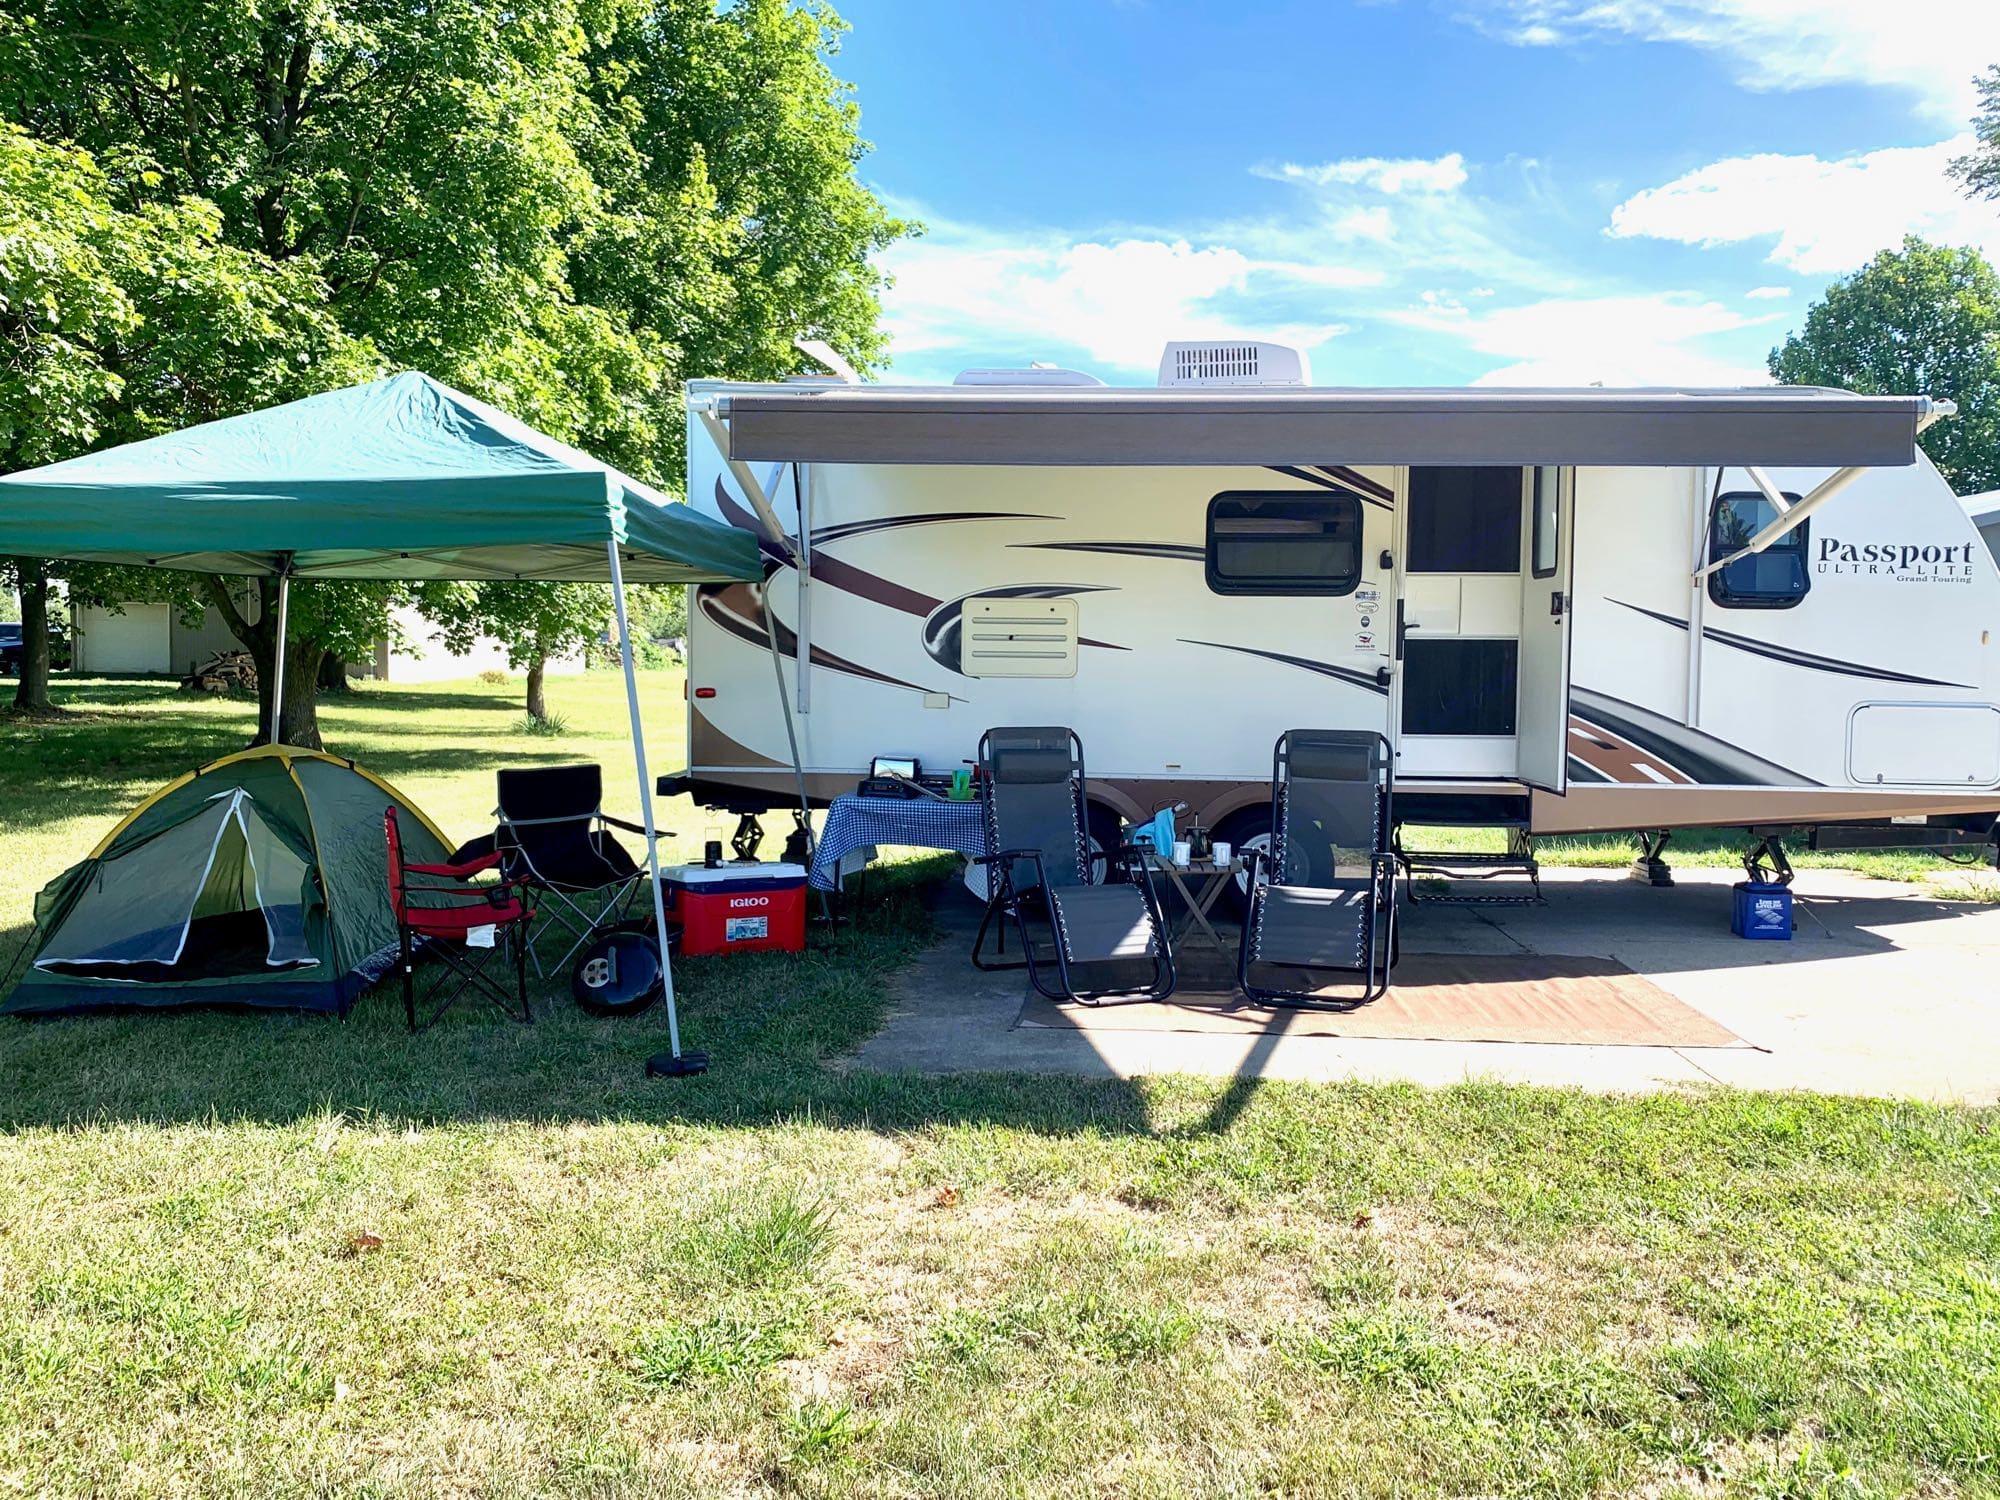 Full camp site ready for fun!. Keystone Passport 2013